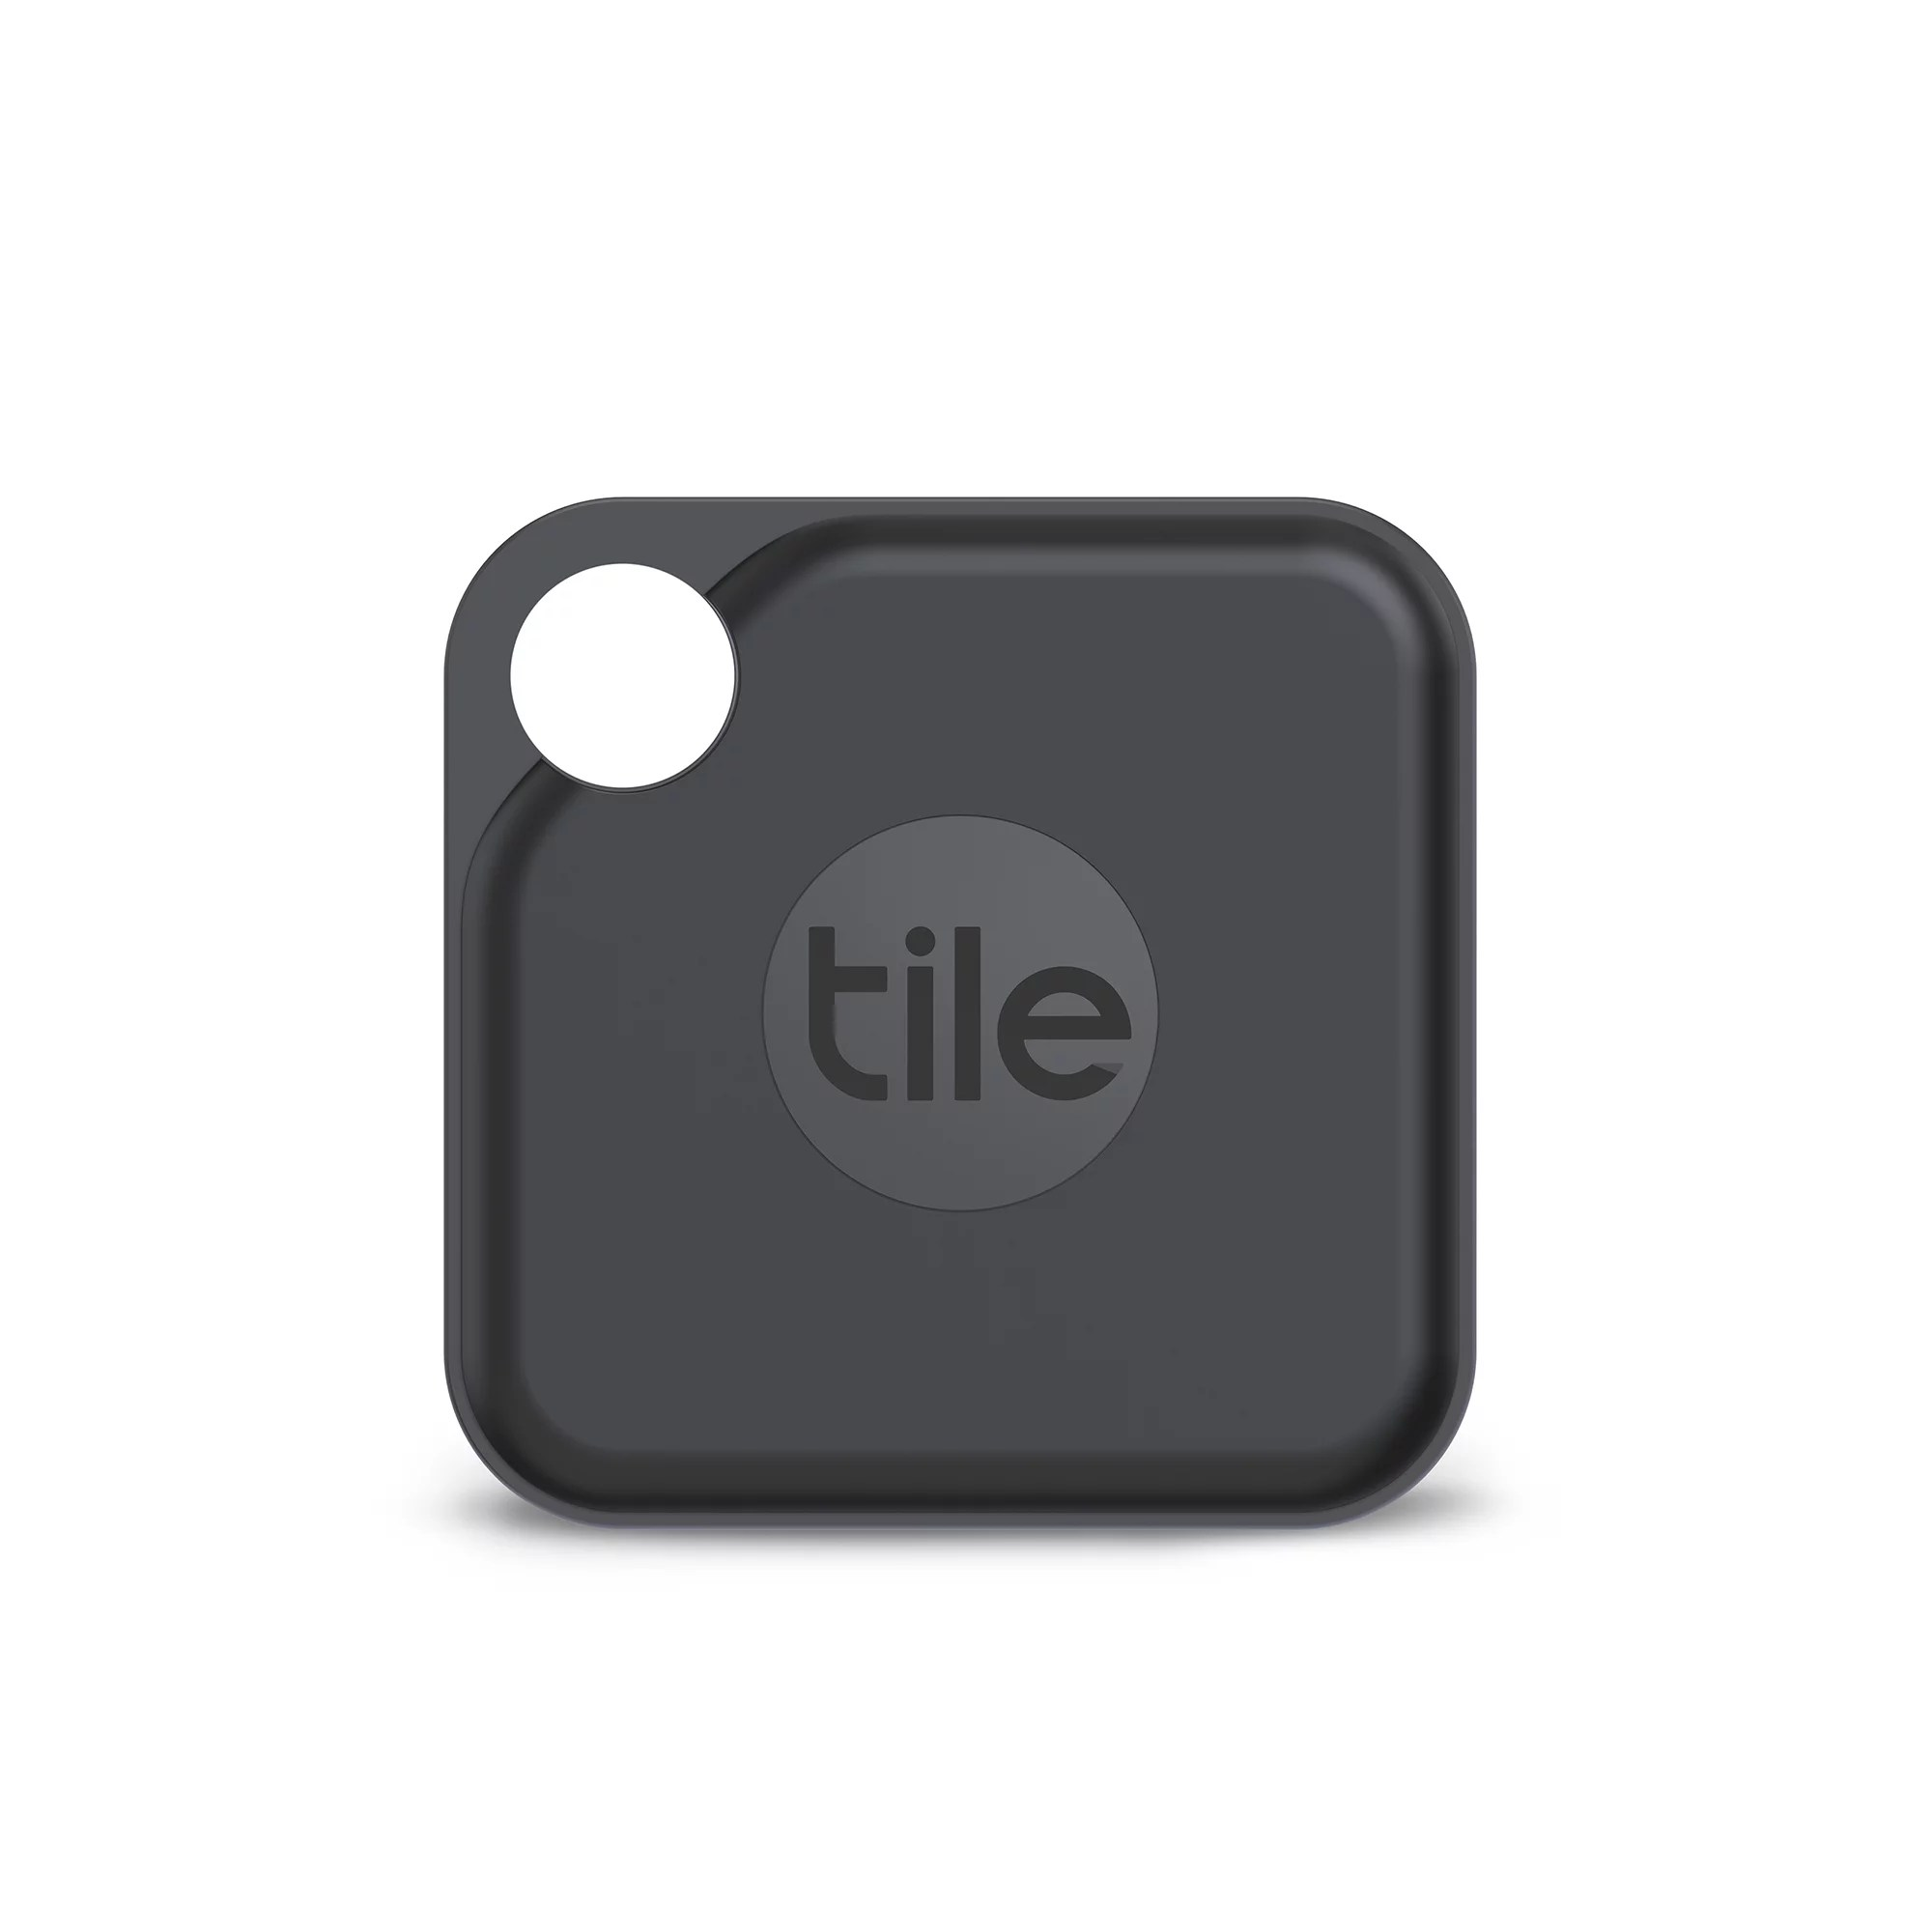 tile re 21001 pro 2020 item tracker black